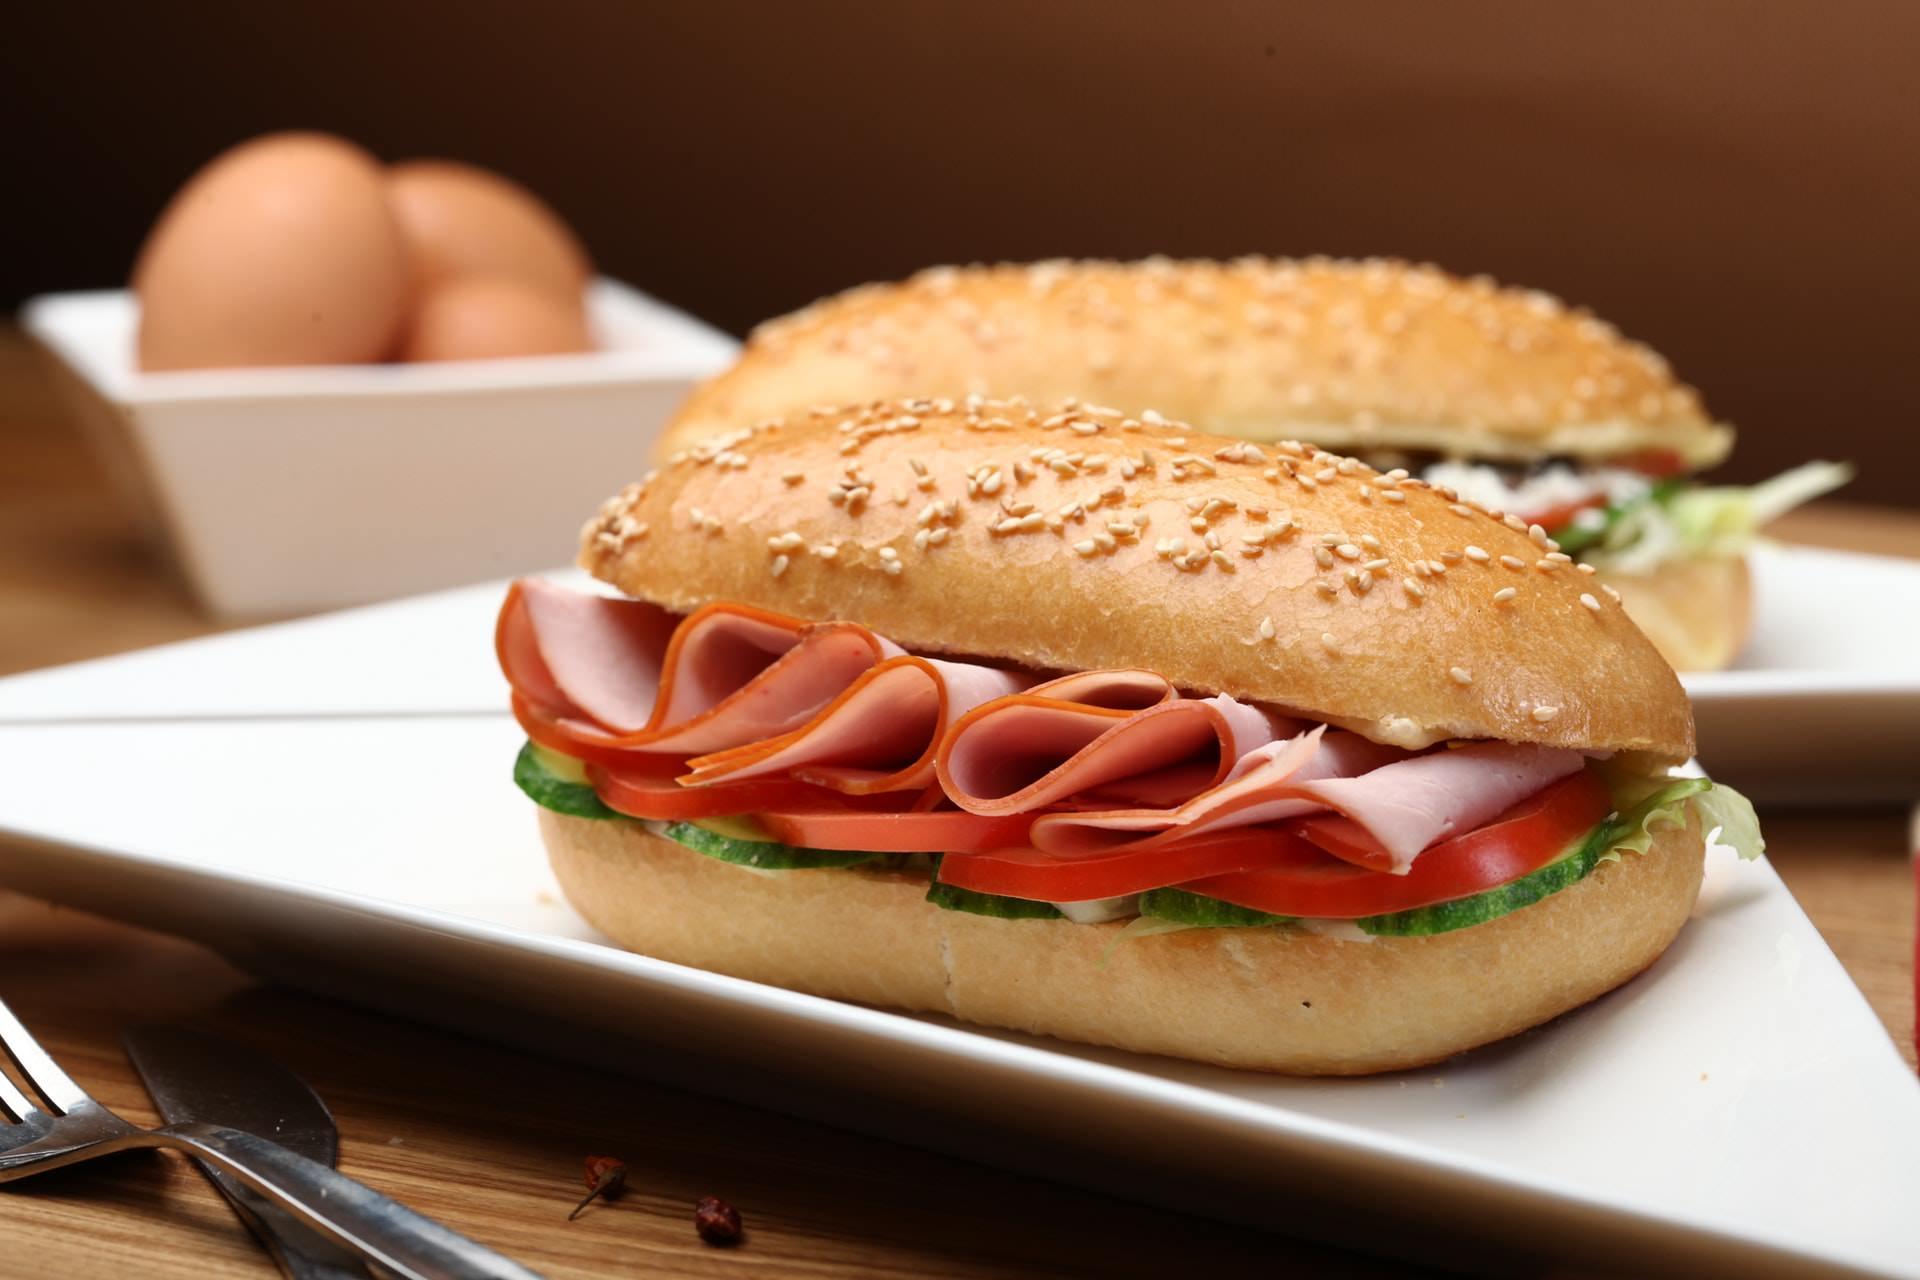 processed deli meat sandwich